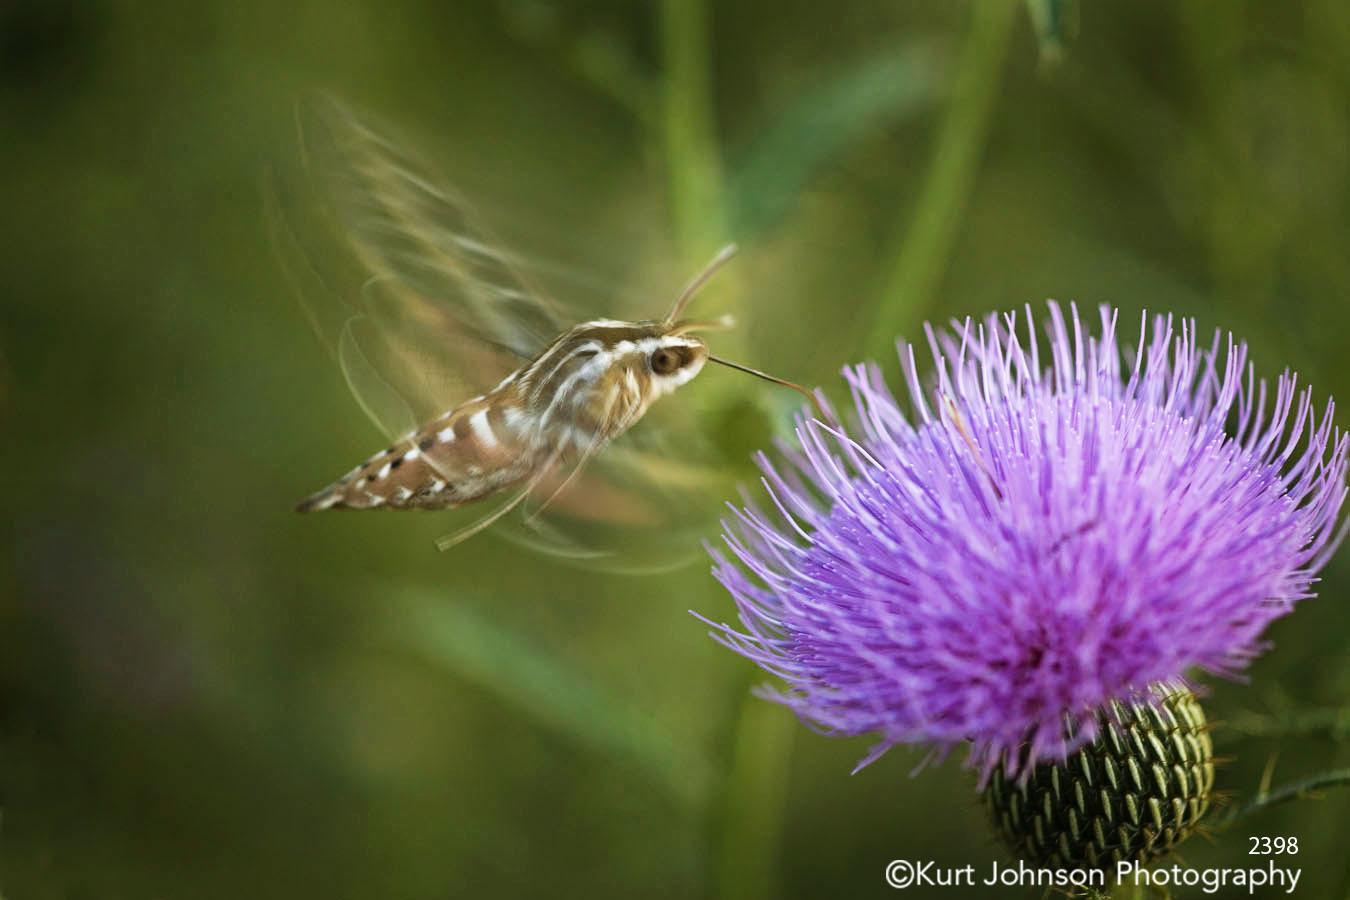 green purple flower hummingbird nature photography wildlife